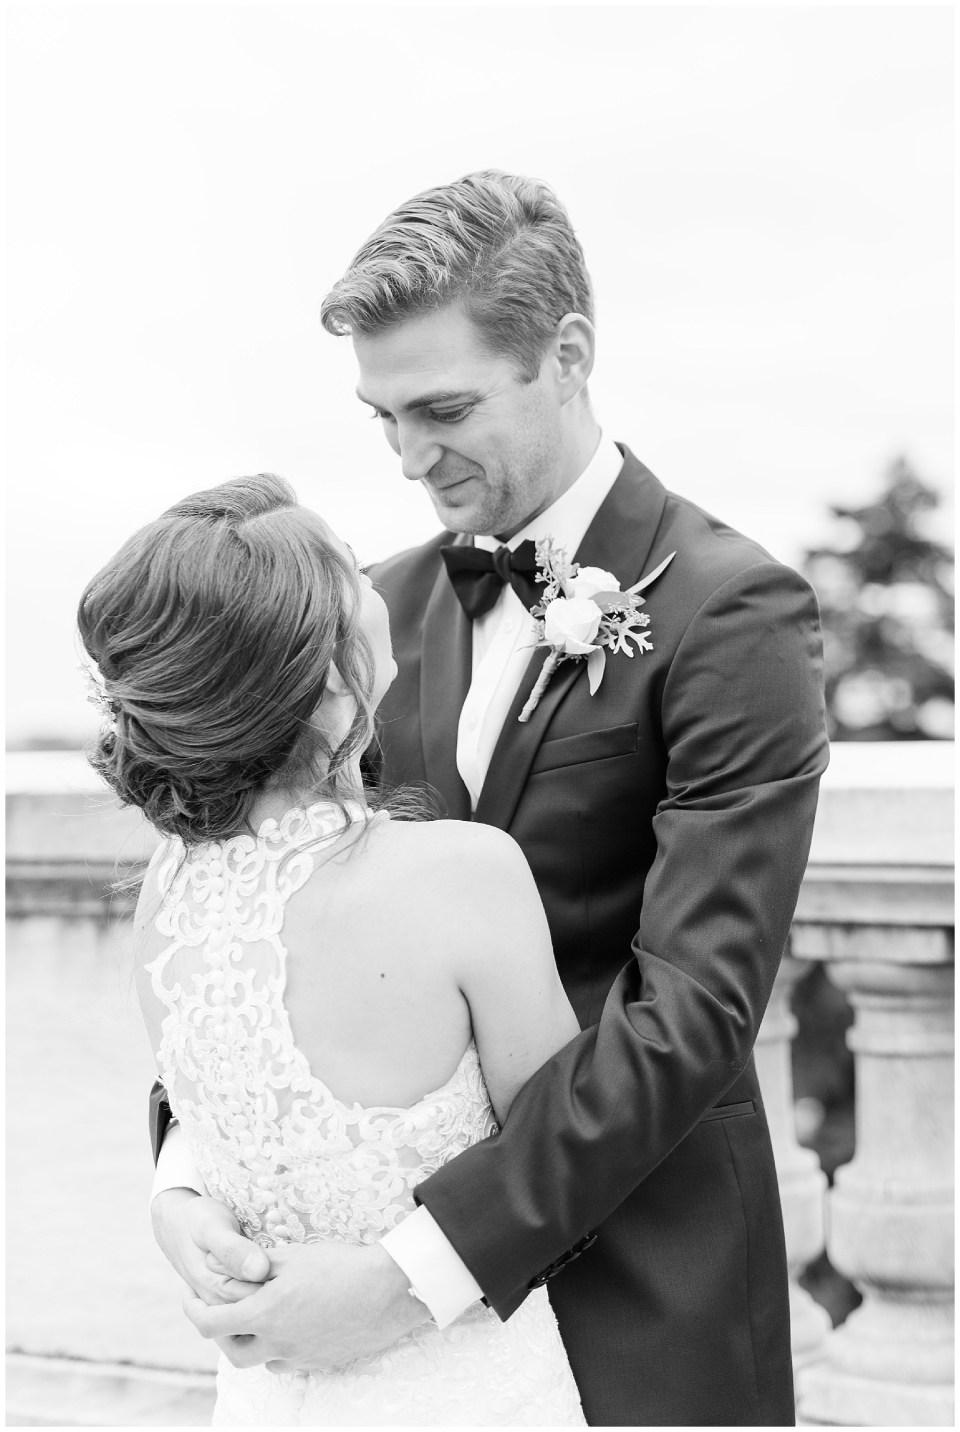 daughters-of-the-american-revolution-dar-dc-wedding-photos-dc-wedding-photographer-fall-wedding-photo-30_photos.jpg